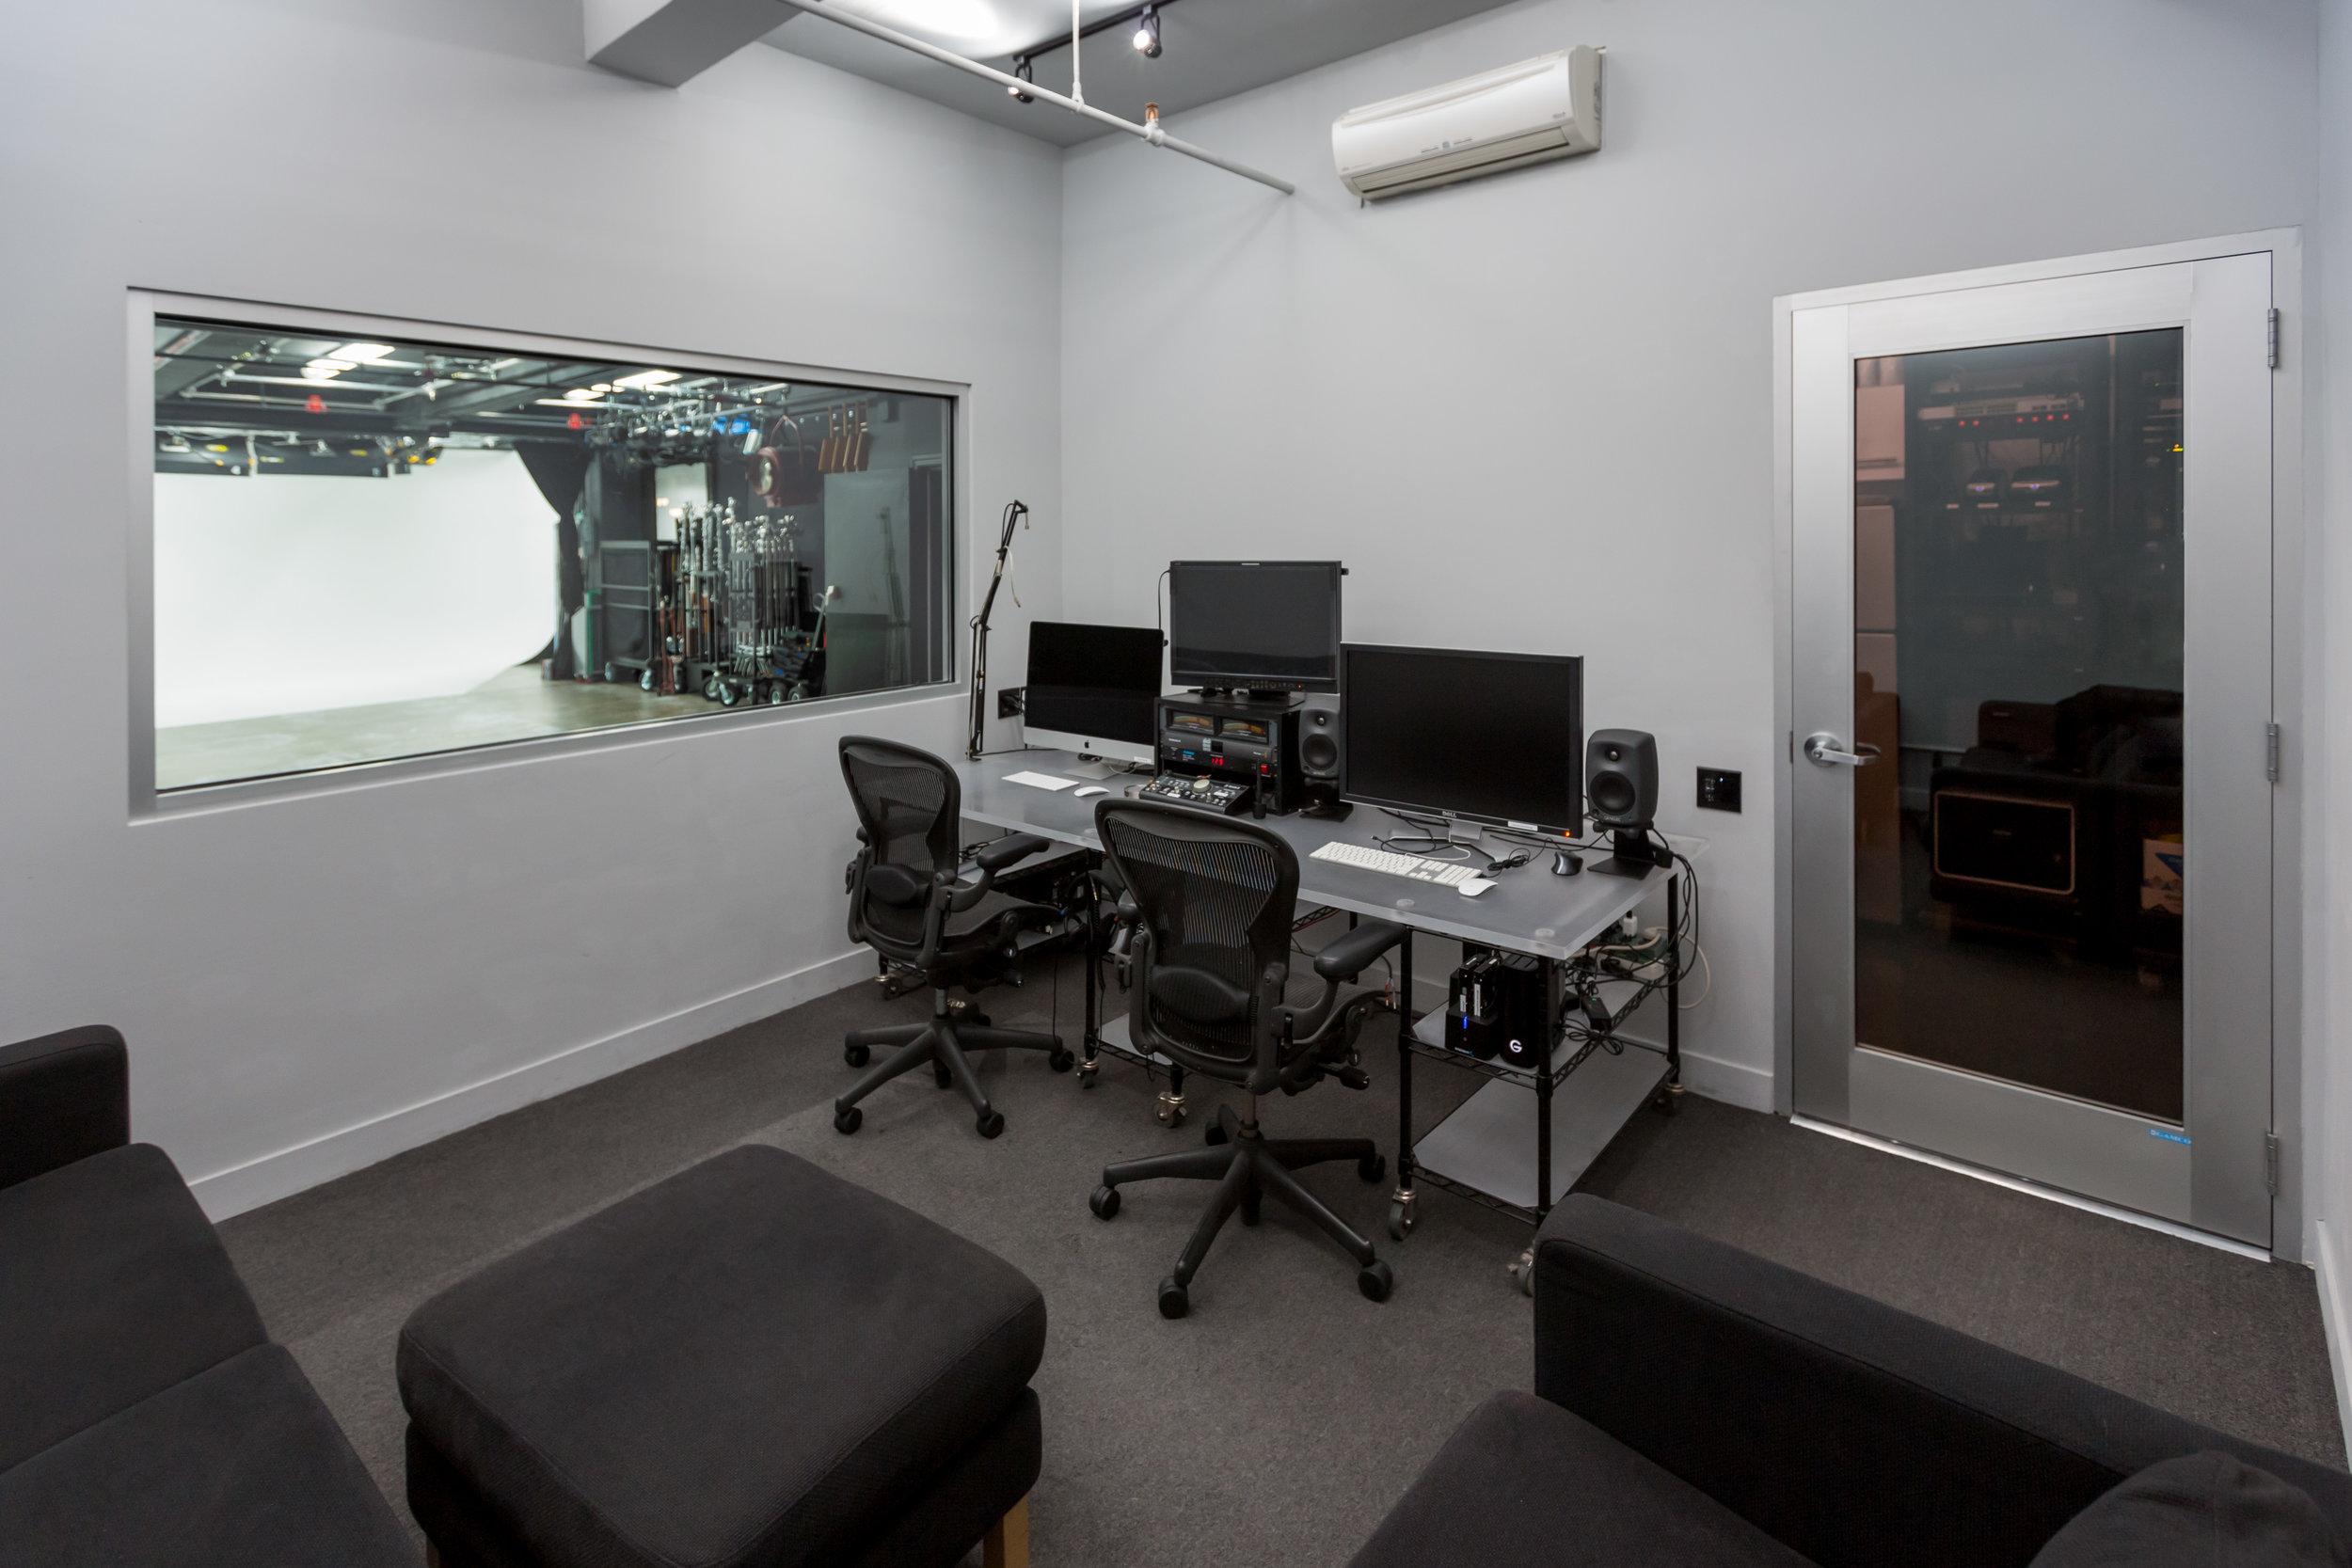 deverge_studio-2017-00010.jpg